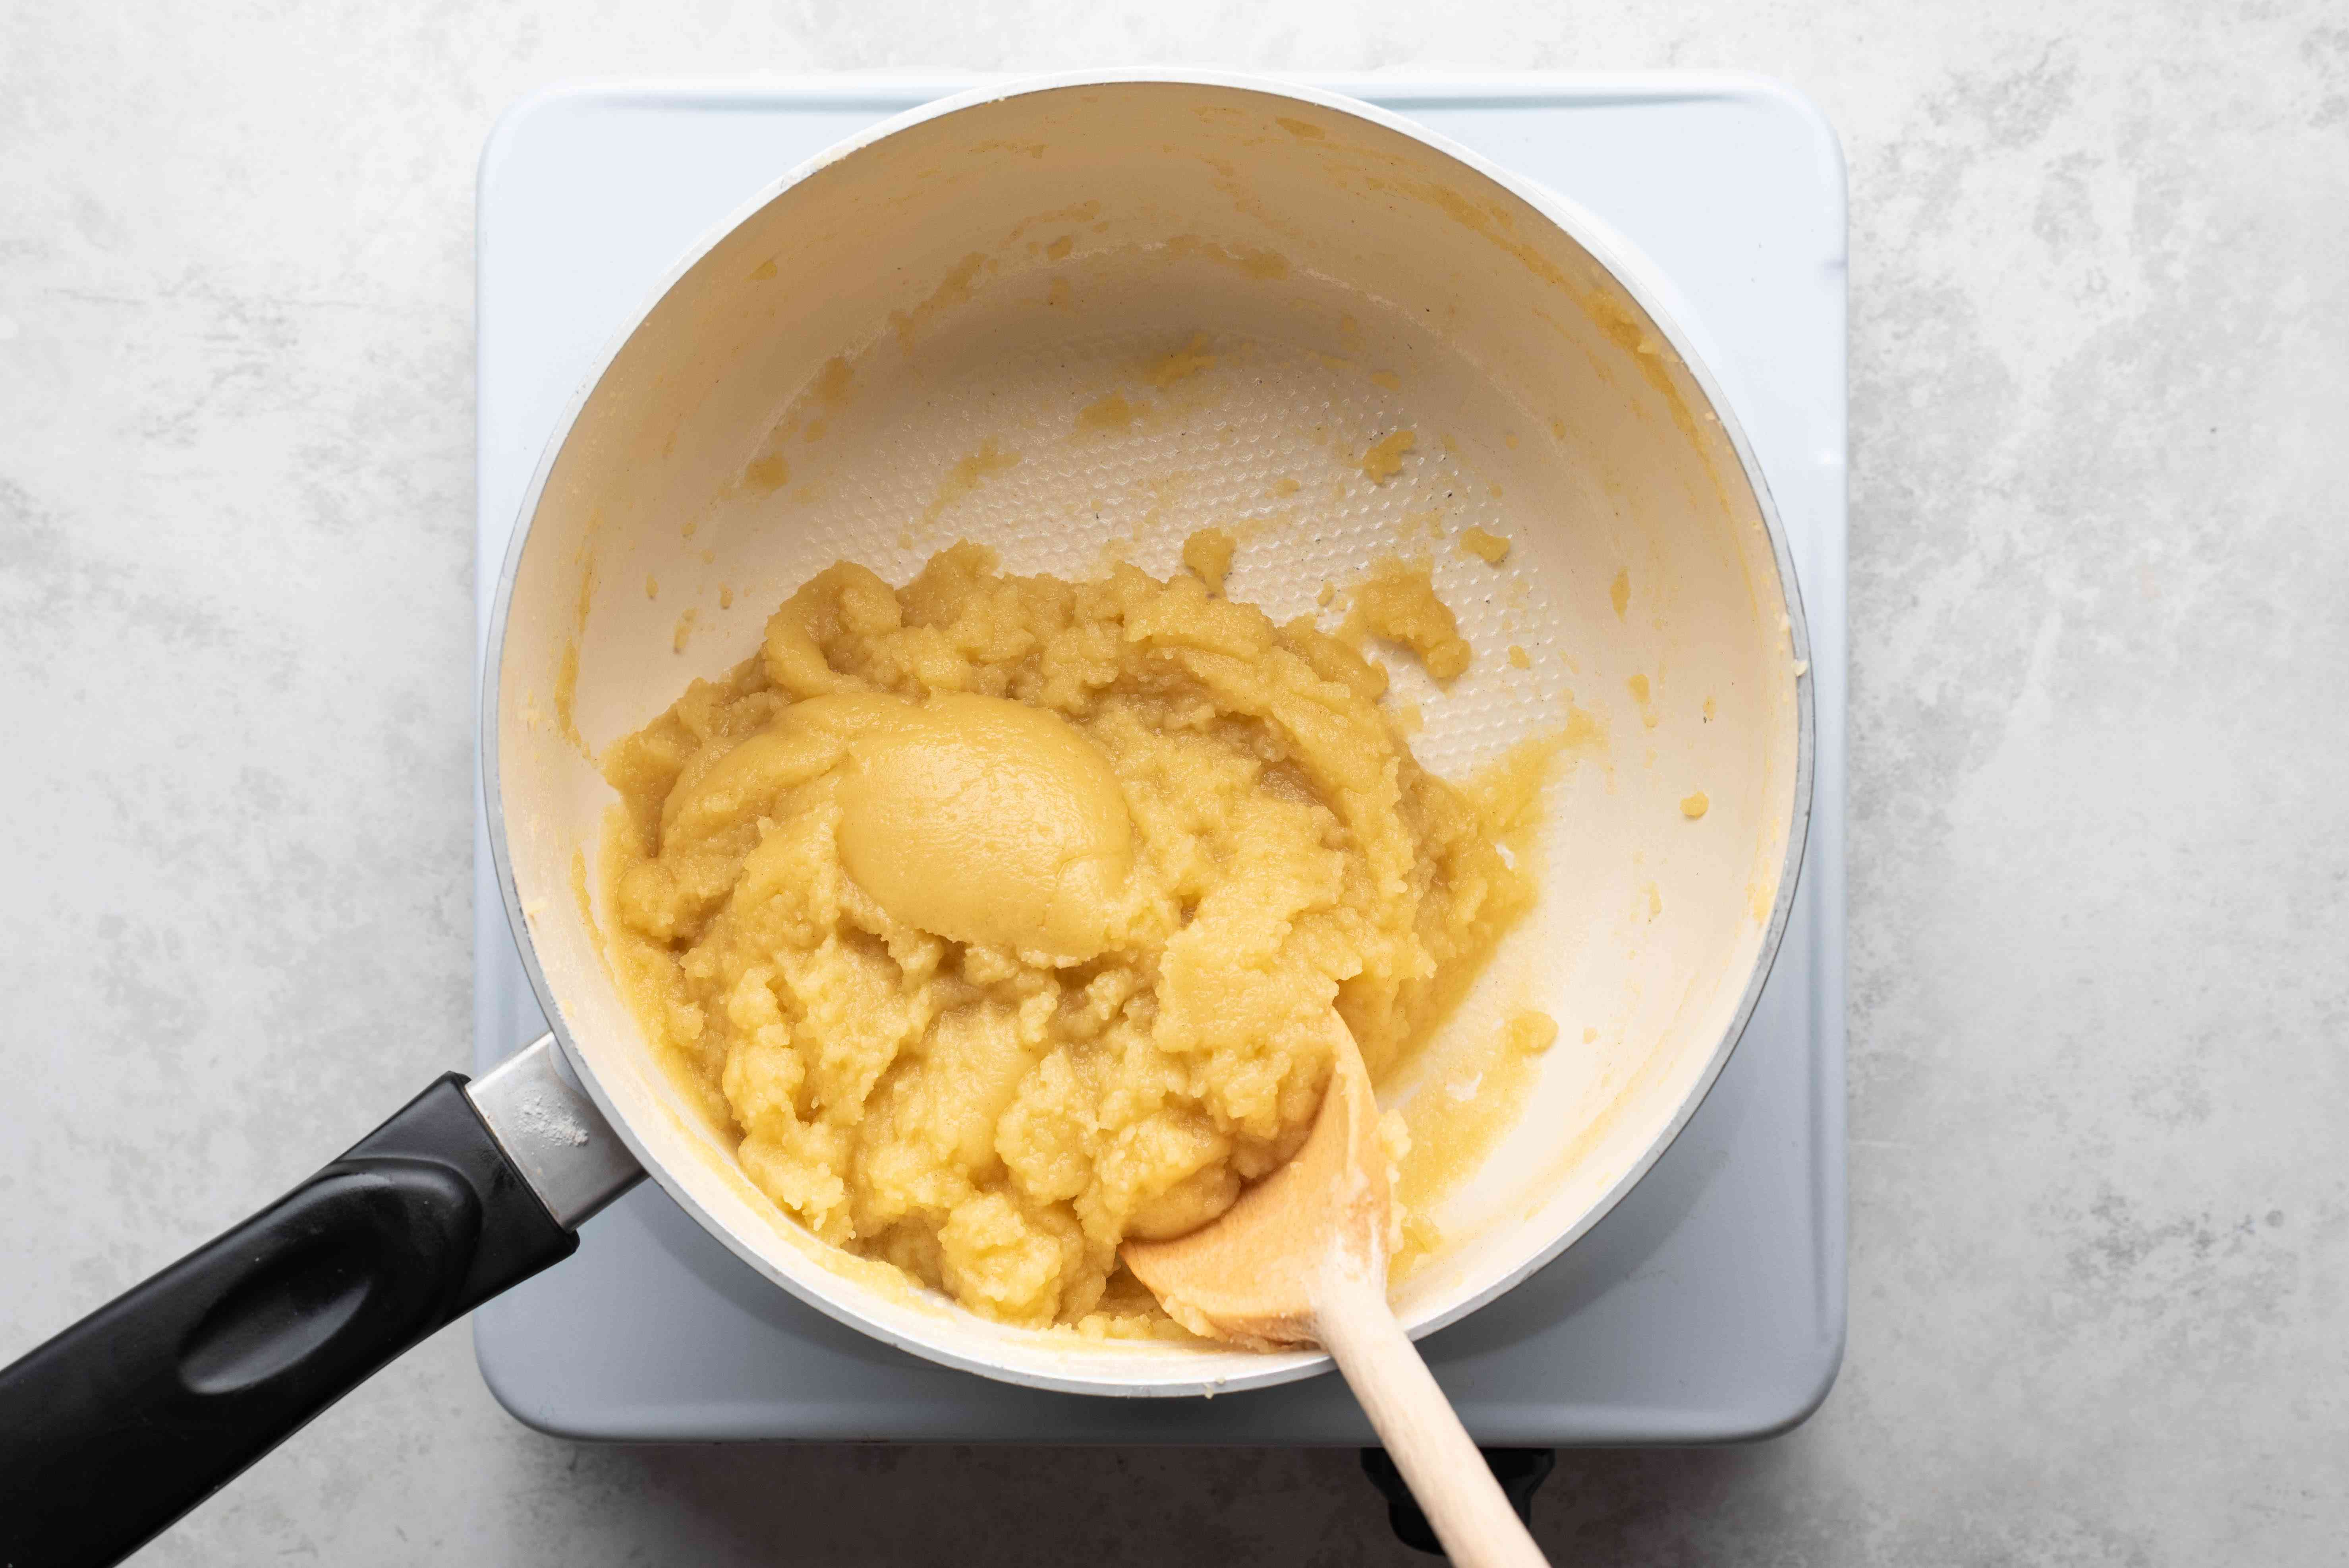 dough in a pan